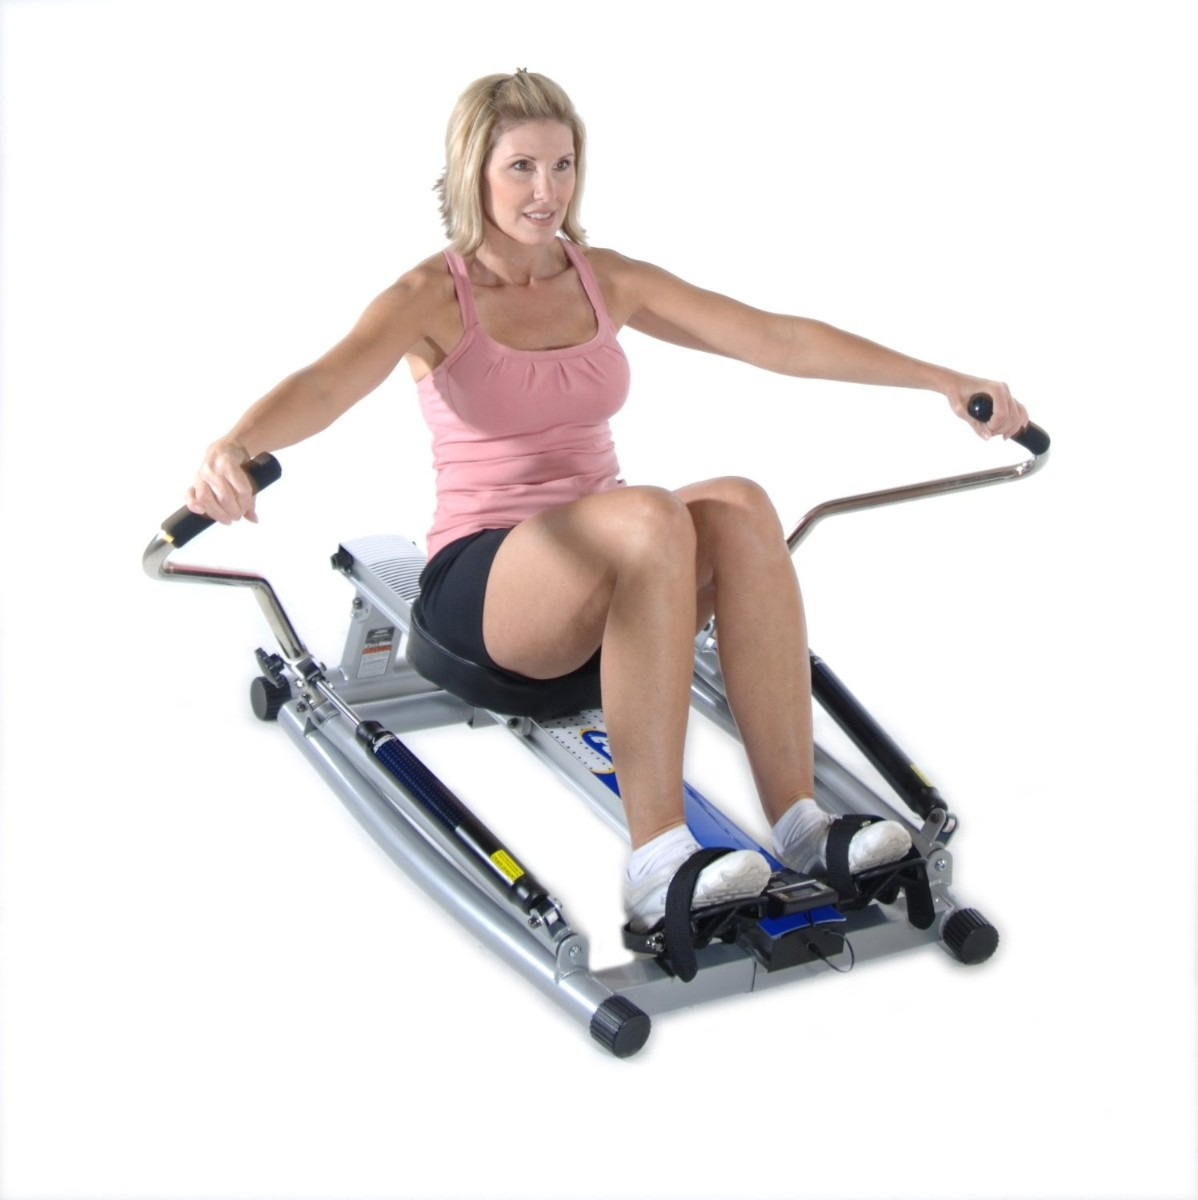 Nueva maquina remo stamina c monitor orbital compacta for Maquinas para gym